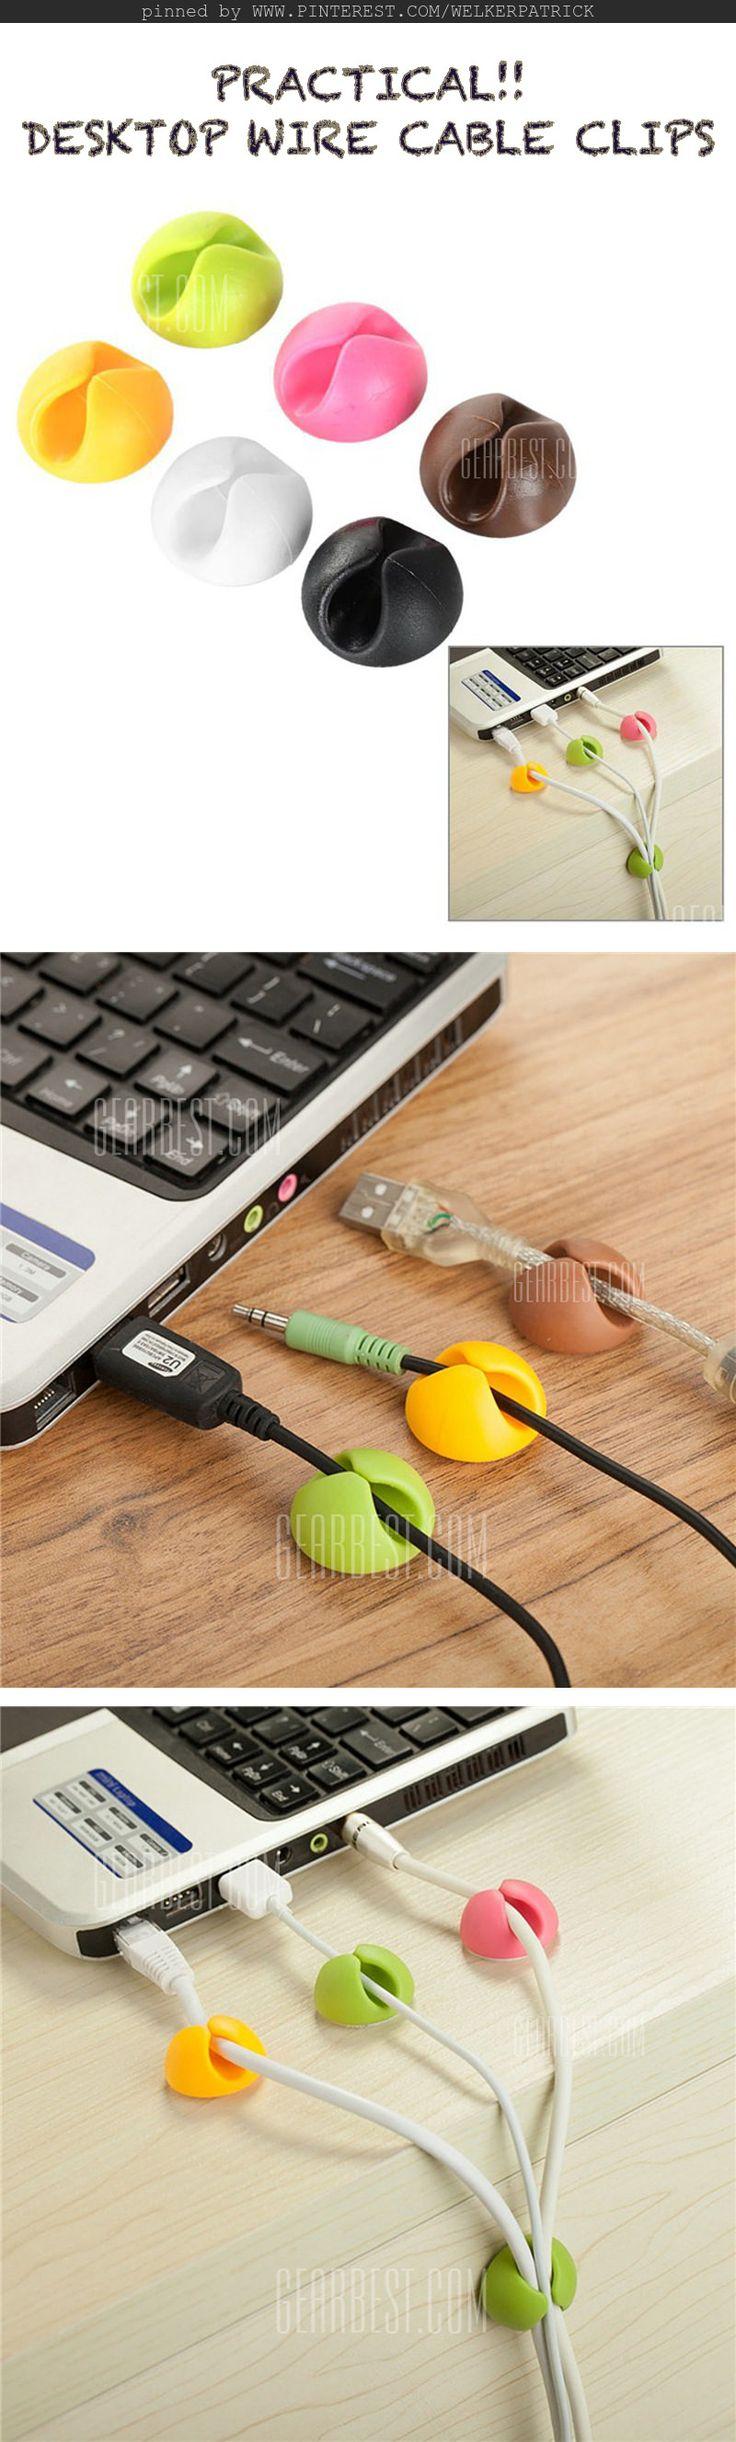 Practical Desktop Wire Cable Clips